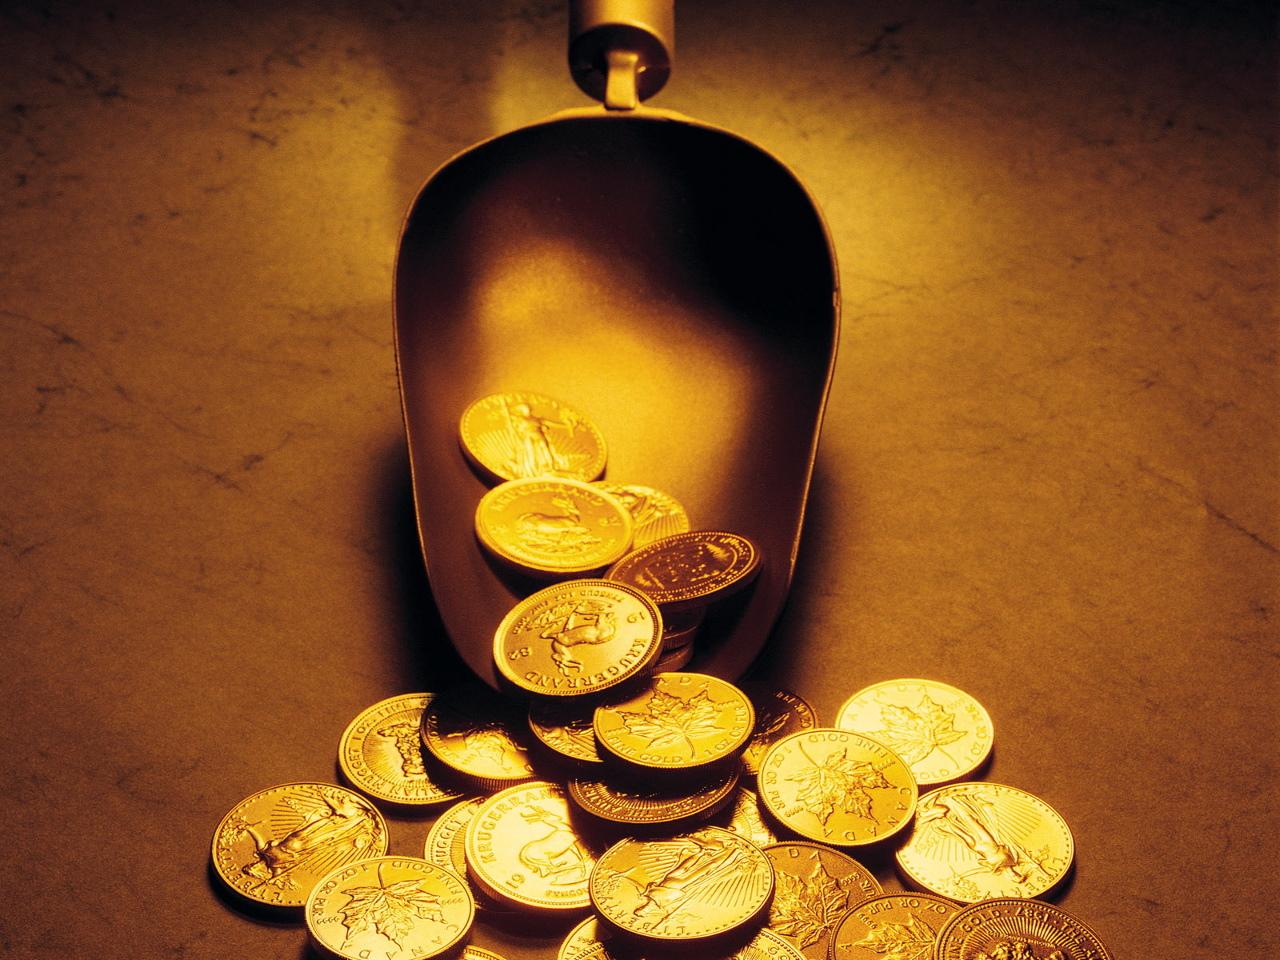 http://4.bp.blogspot.com/-0FIuCcaVldM/TbvP18Iub6I/AAAAAAAAAYU/w8Eh0obYDrc/s1600/gold_coins-6908.jpg